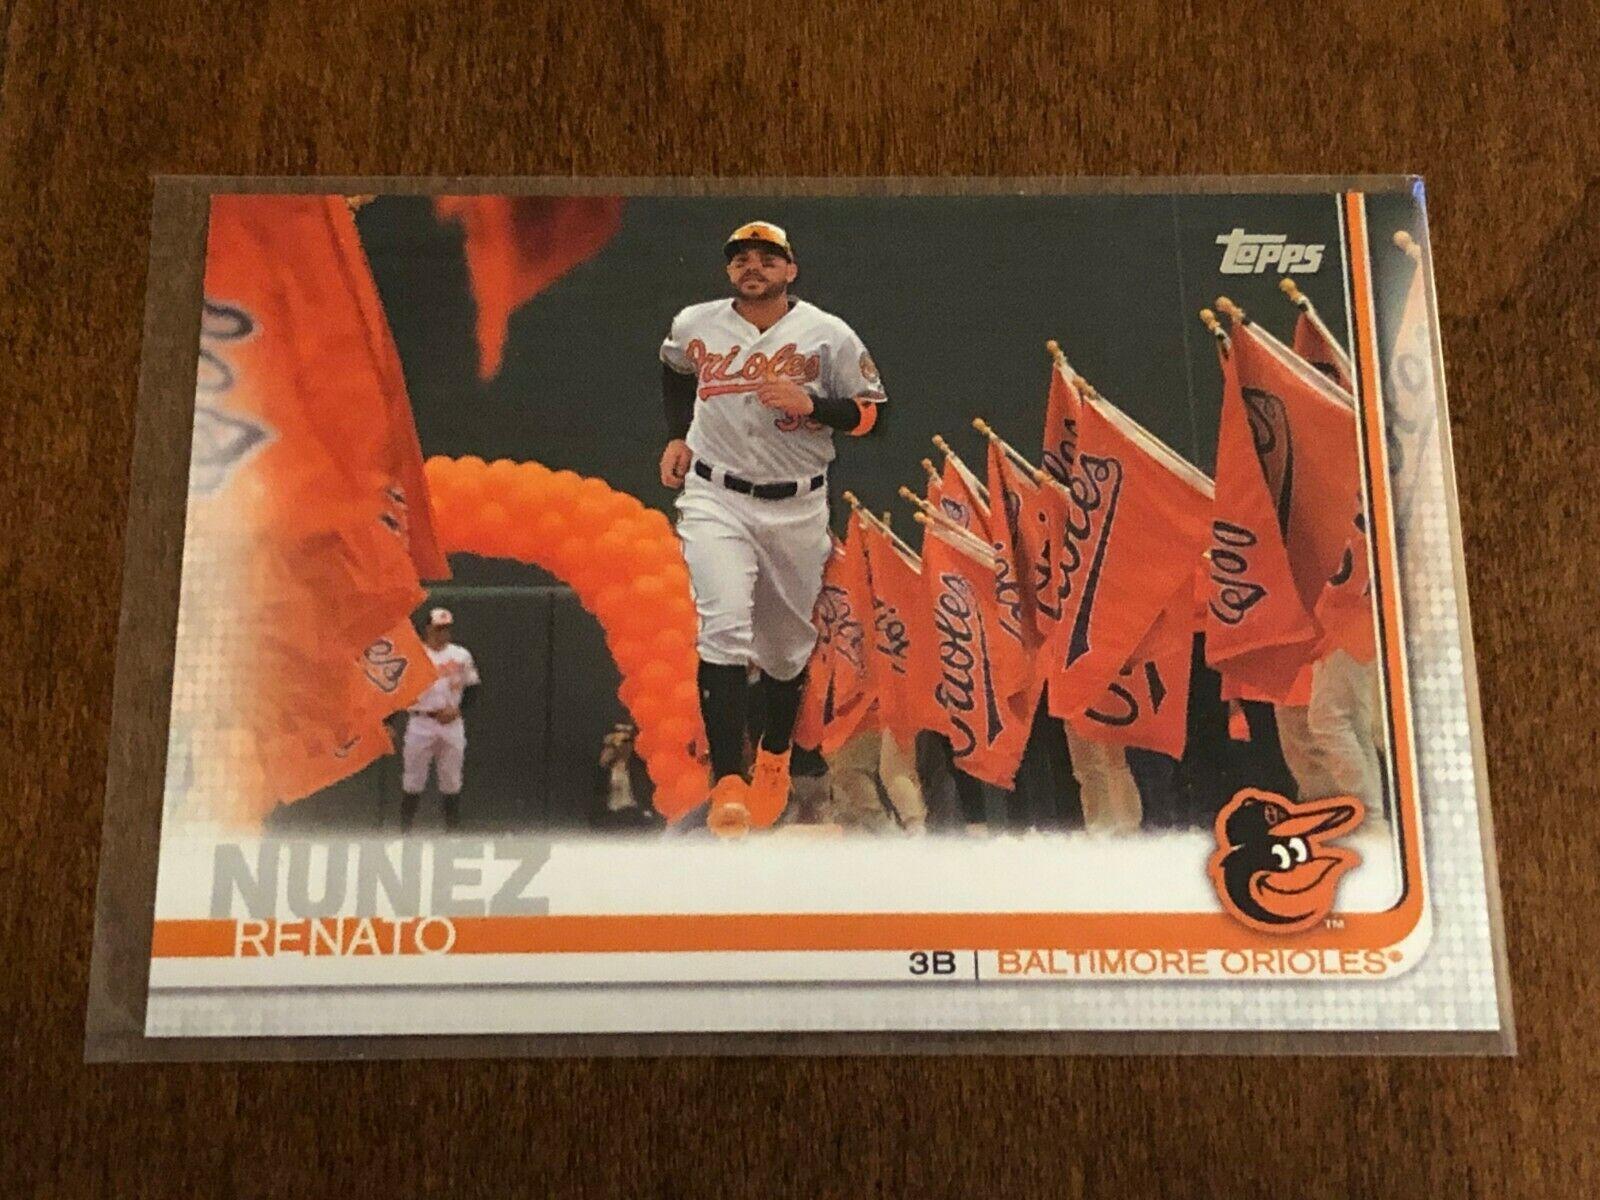 2019 Topps Update Baseball Advanced Stat - Renato Nunez - Baltimore Orioles